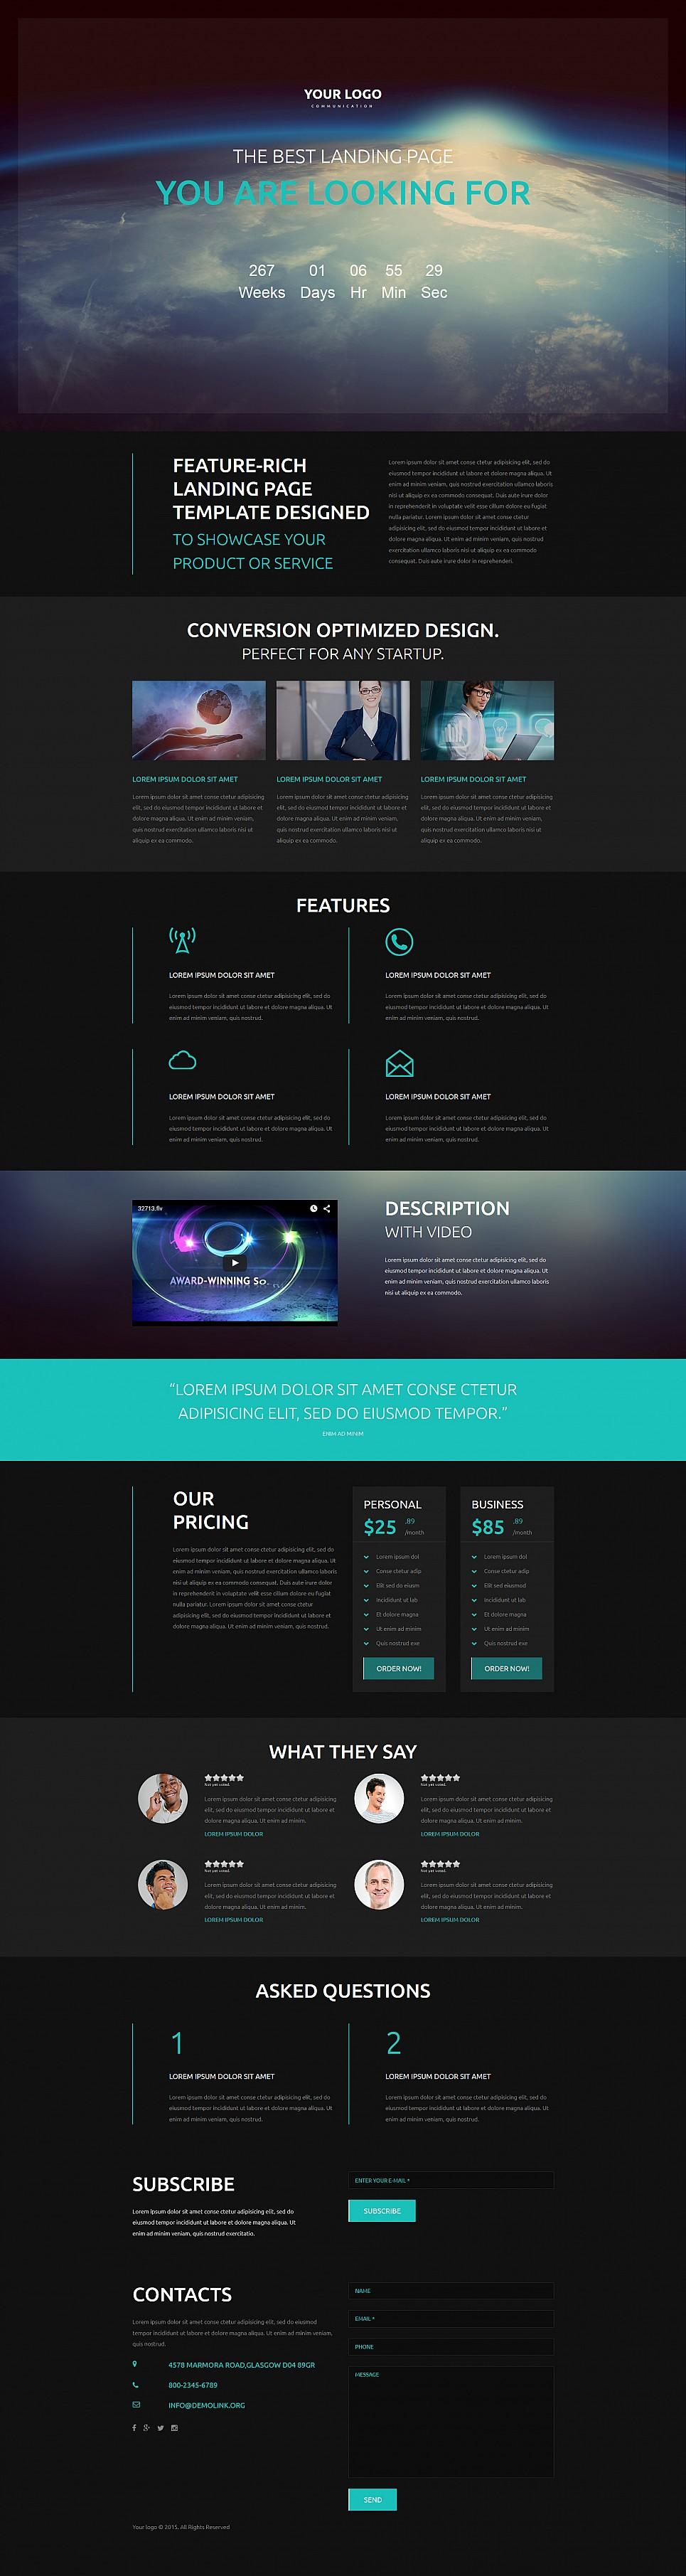 Cosmic website template for businessmen